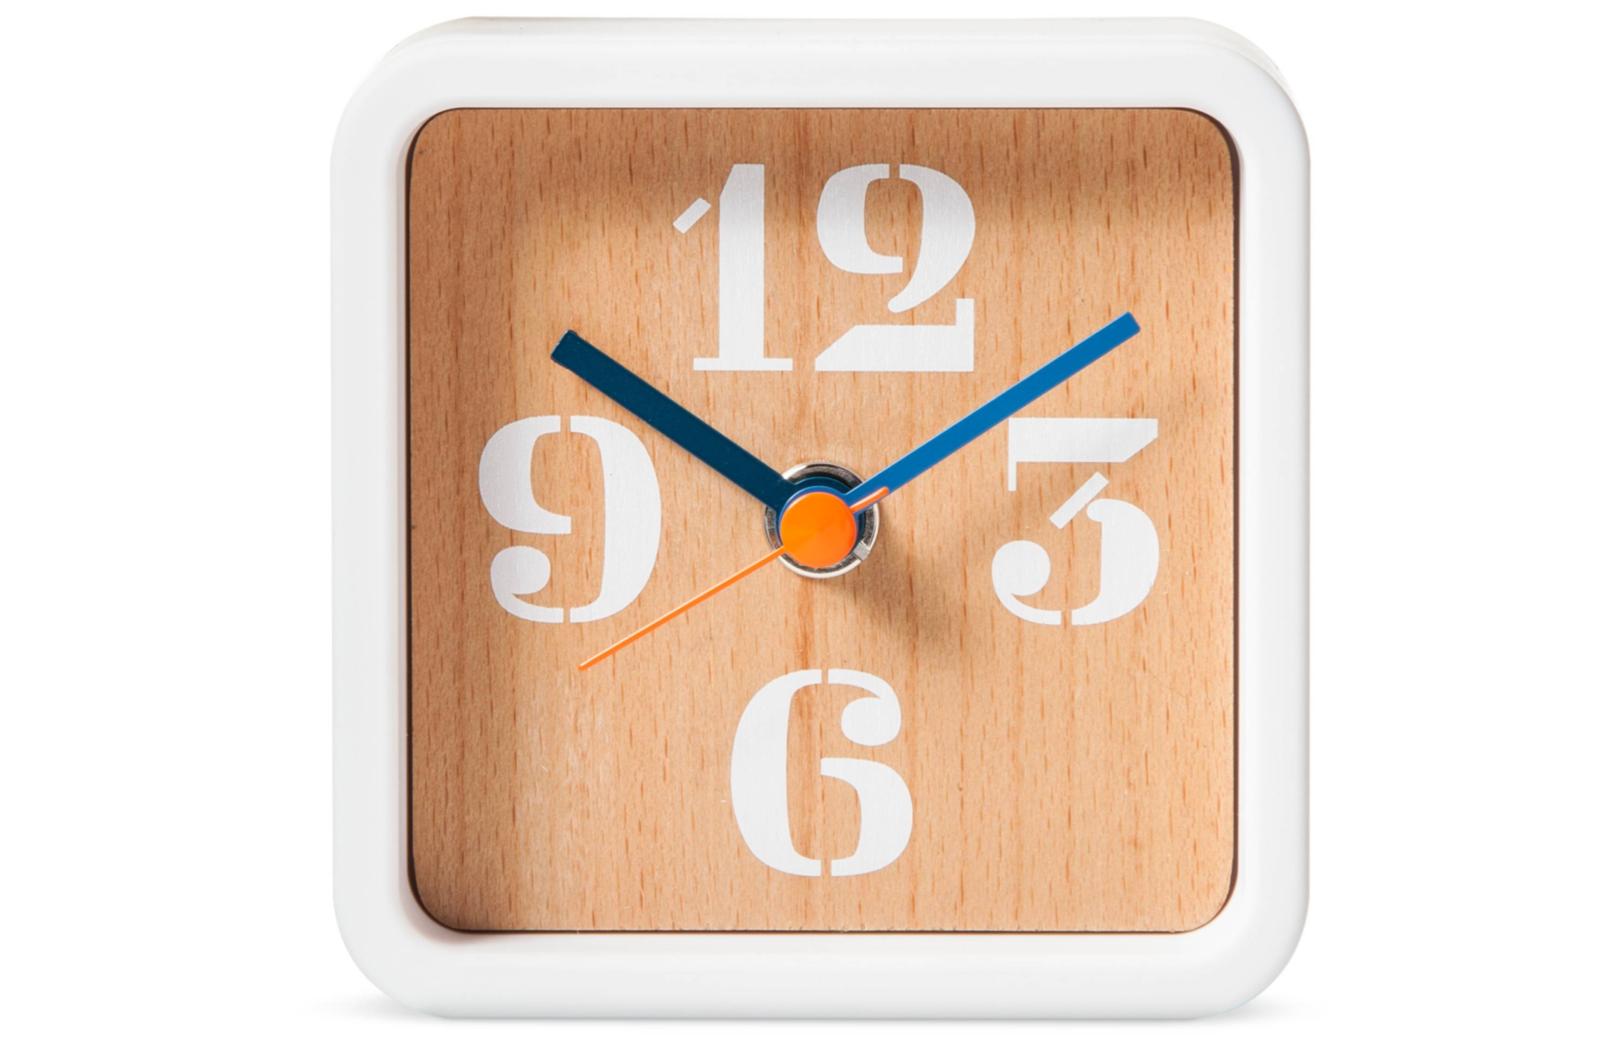 modern by dwell magazine desk clock by dwell  dwell - modern by dwell magazine desk clock